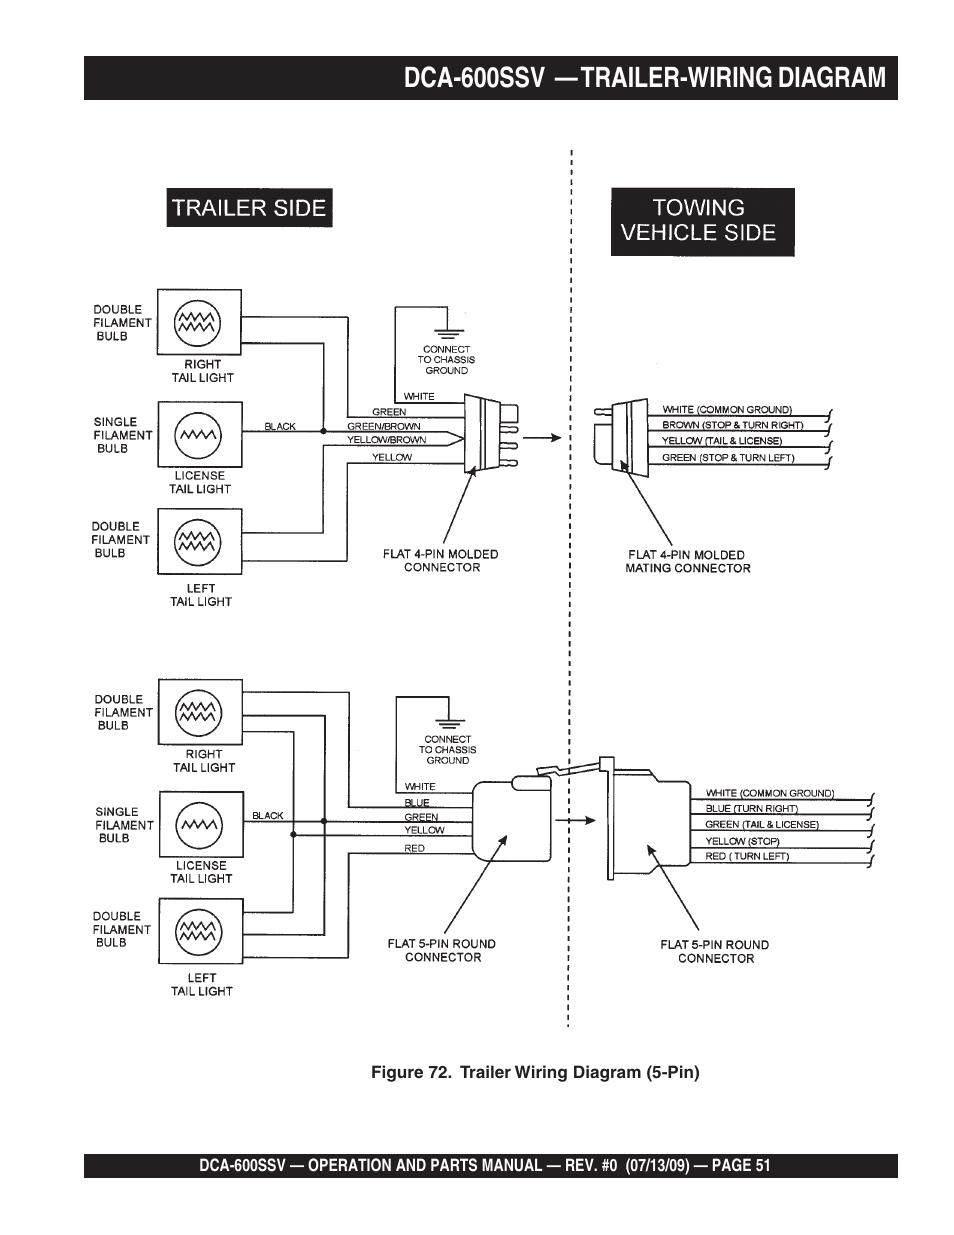 medium resolution of ssv works wiring diagram wiring diagram ssv works wiring diagram